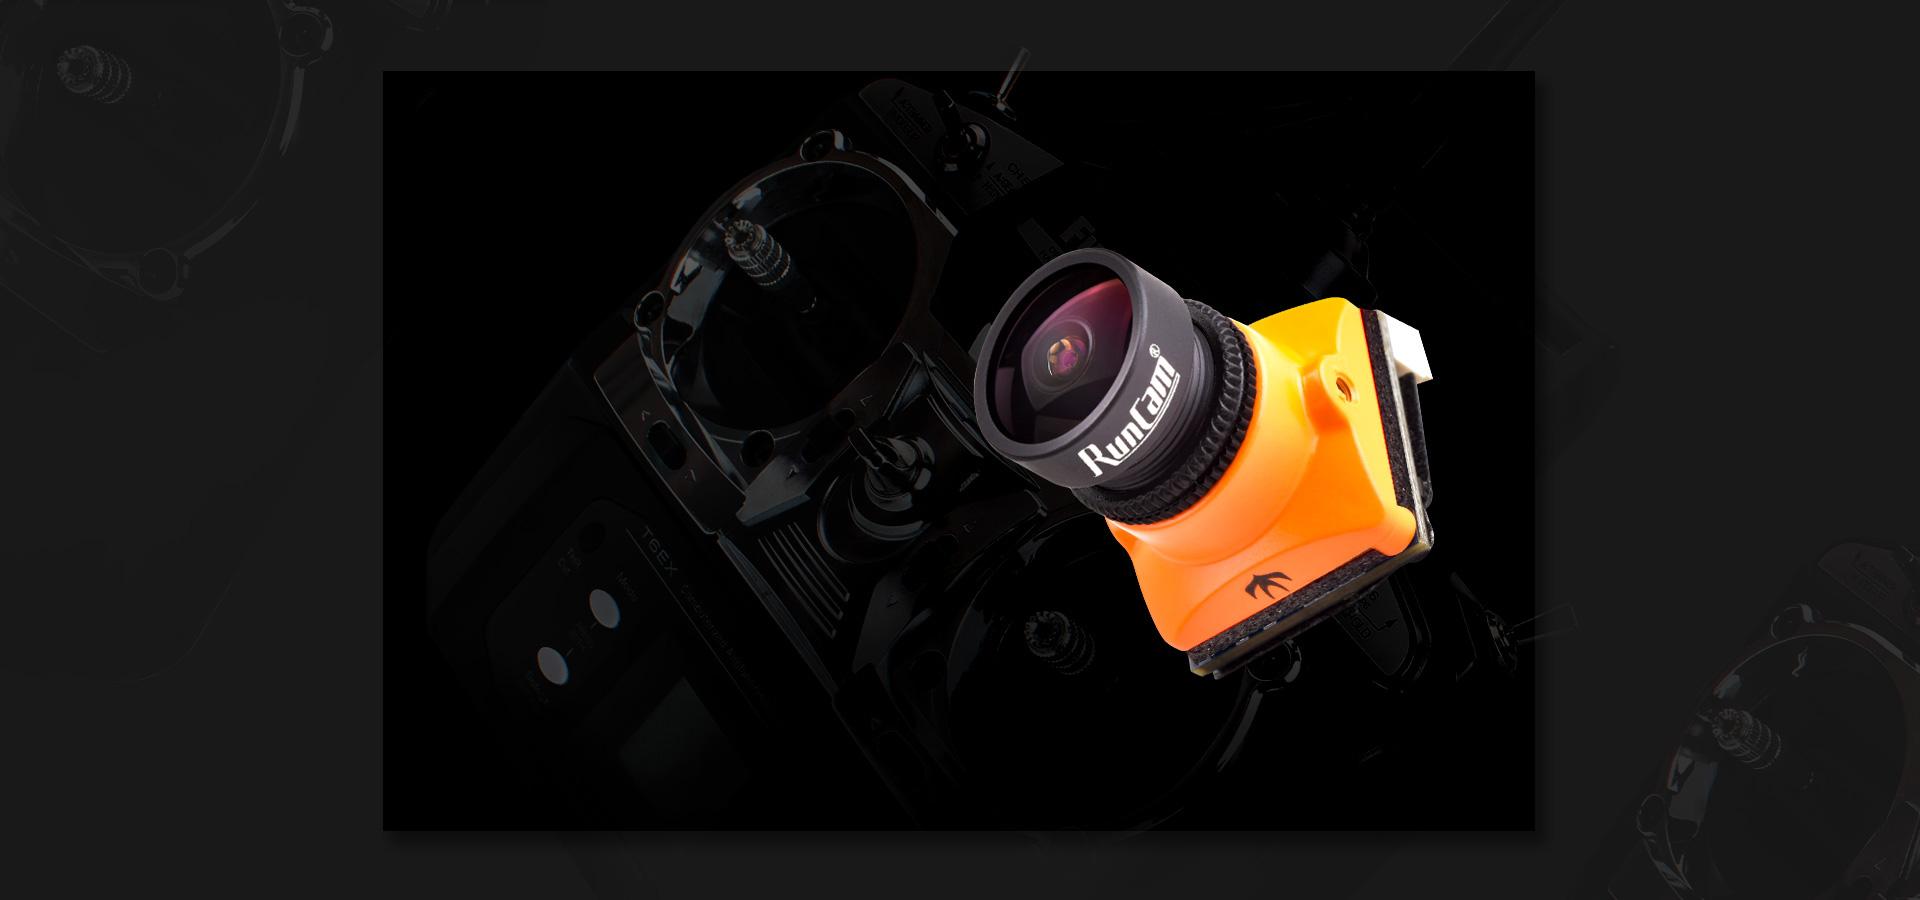 Runcam Micro Swift 3 13 SONY Super HAD II CCD 2.1mm NTSC 43 600TVL CCD Mini FPV Camera 5